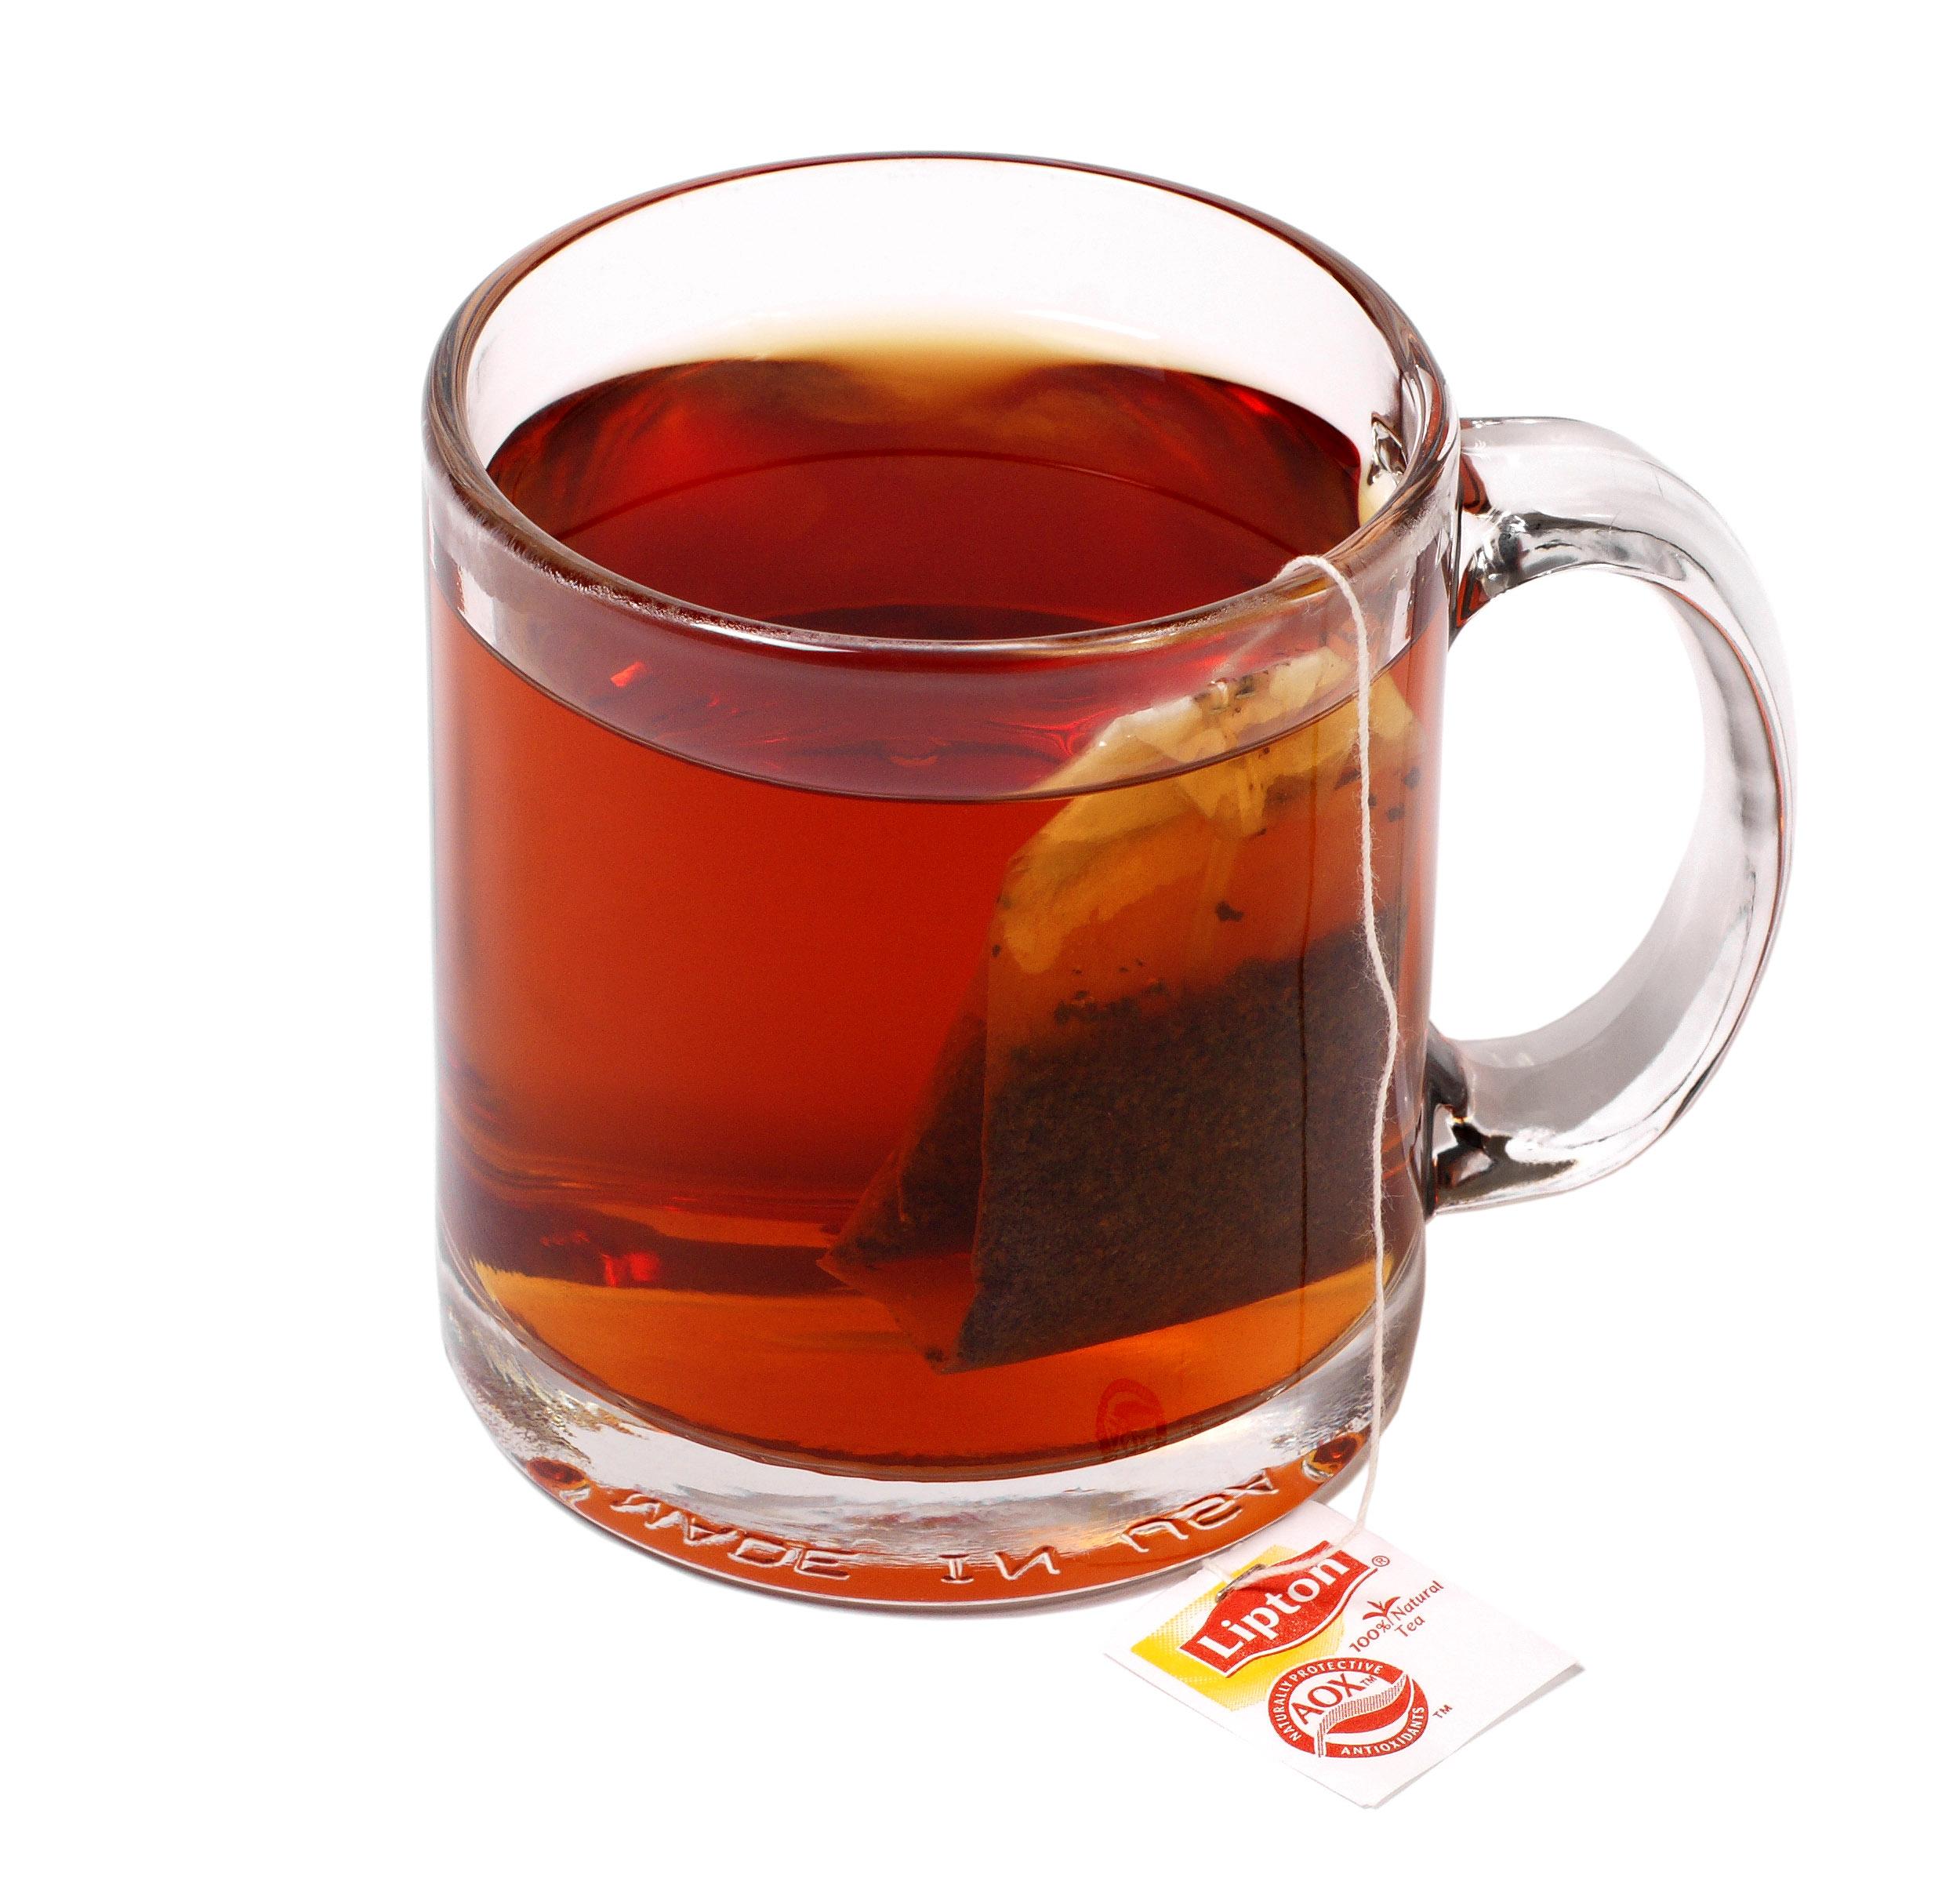 Lipton tea clipart clip free library File:Lipton-mug-tea.jpg - Wikimedia Commons clip free library